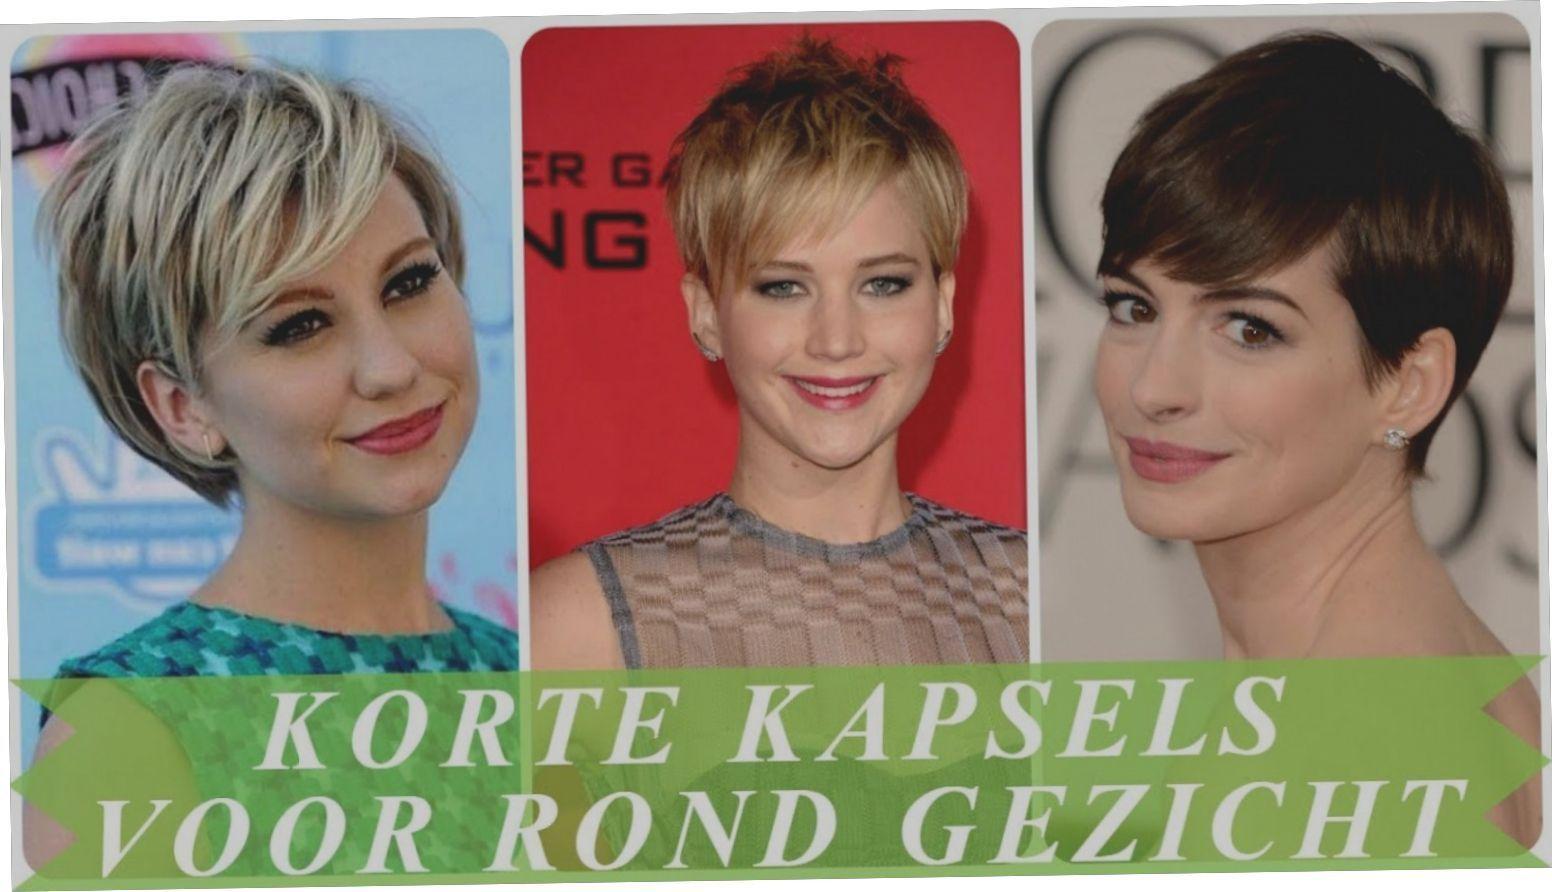 Nieuw Korte Kapsels Smal Gezicht Nieuw Korte Kapsels Smal Gezicht Nieuw Korte Kapsels Sma Womens Hairstyles New Haircuts Haircut And Color